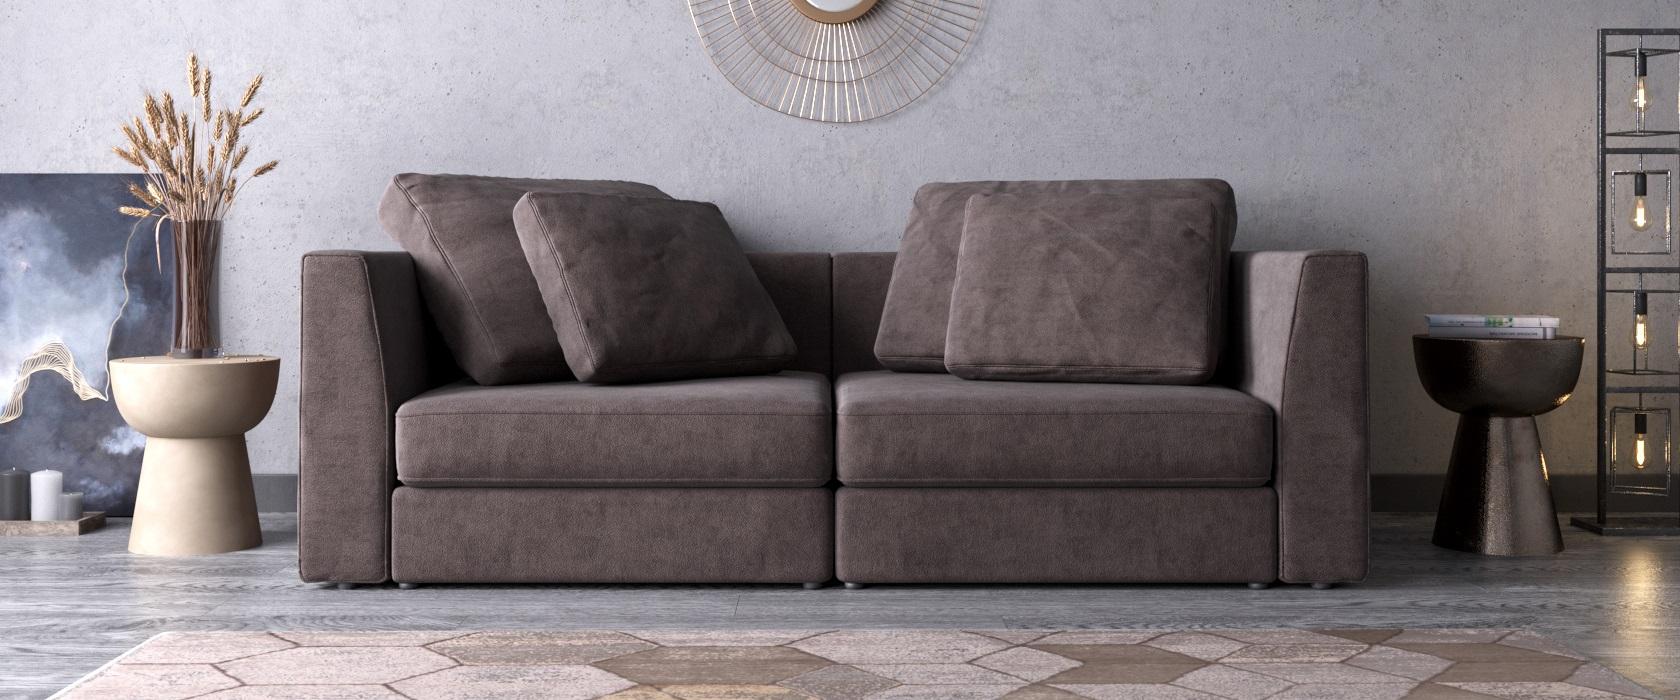 Трехместный диван Lisboa - Фото 1 - Pufetto